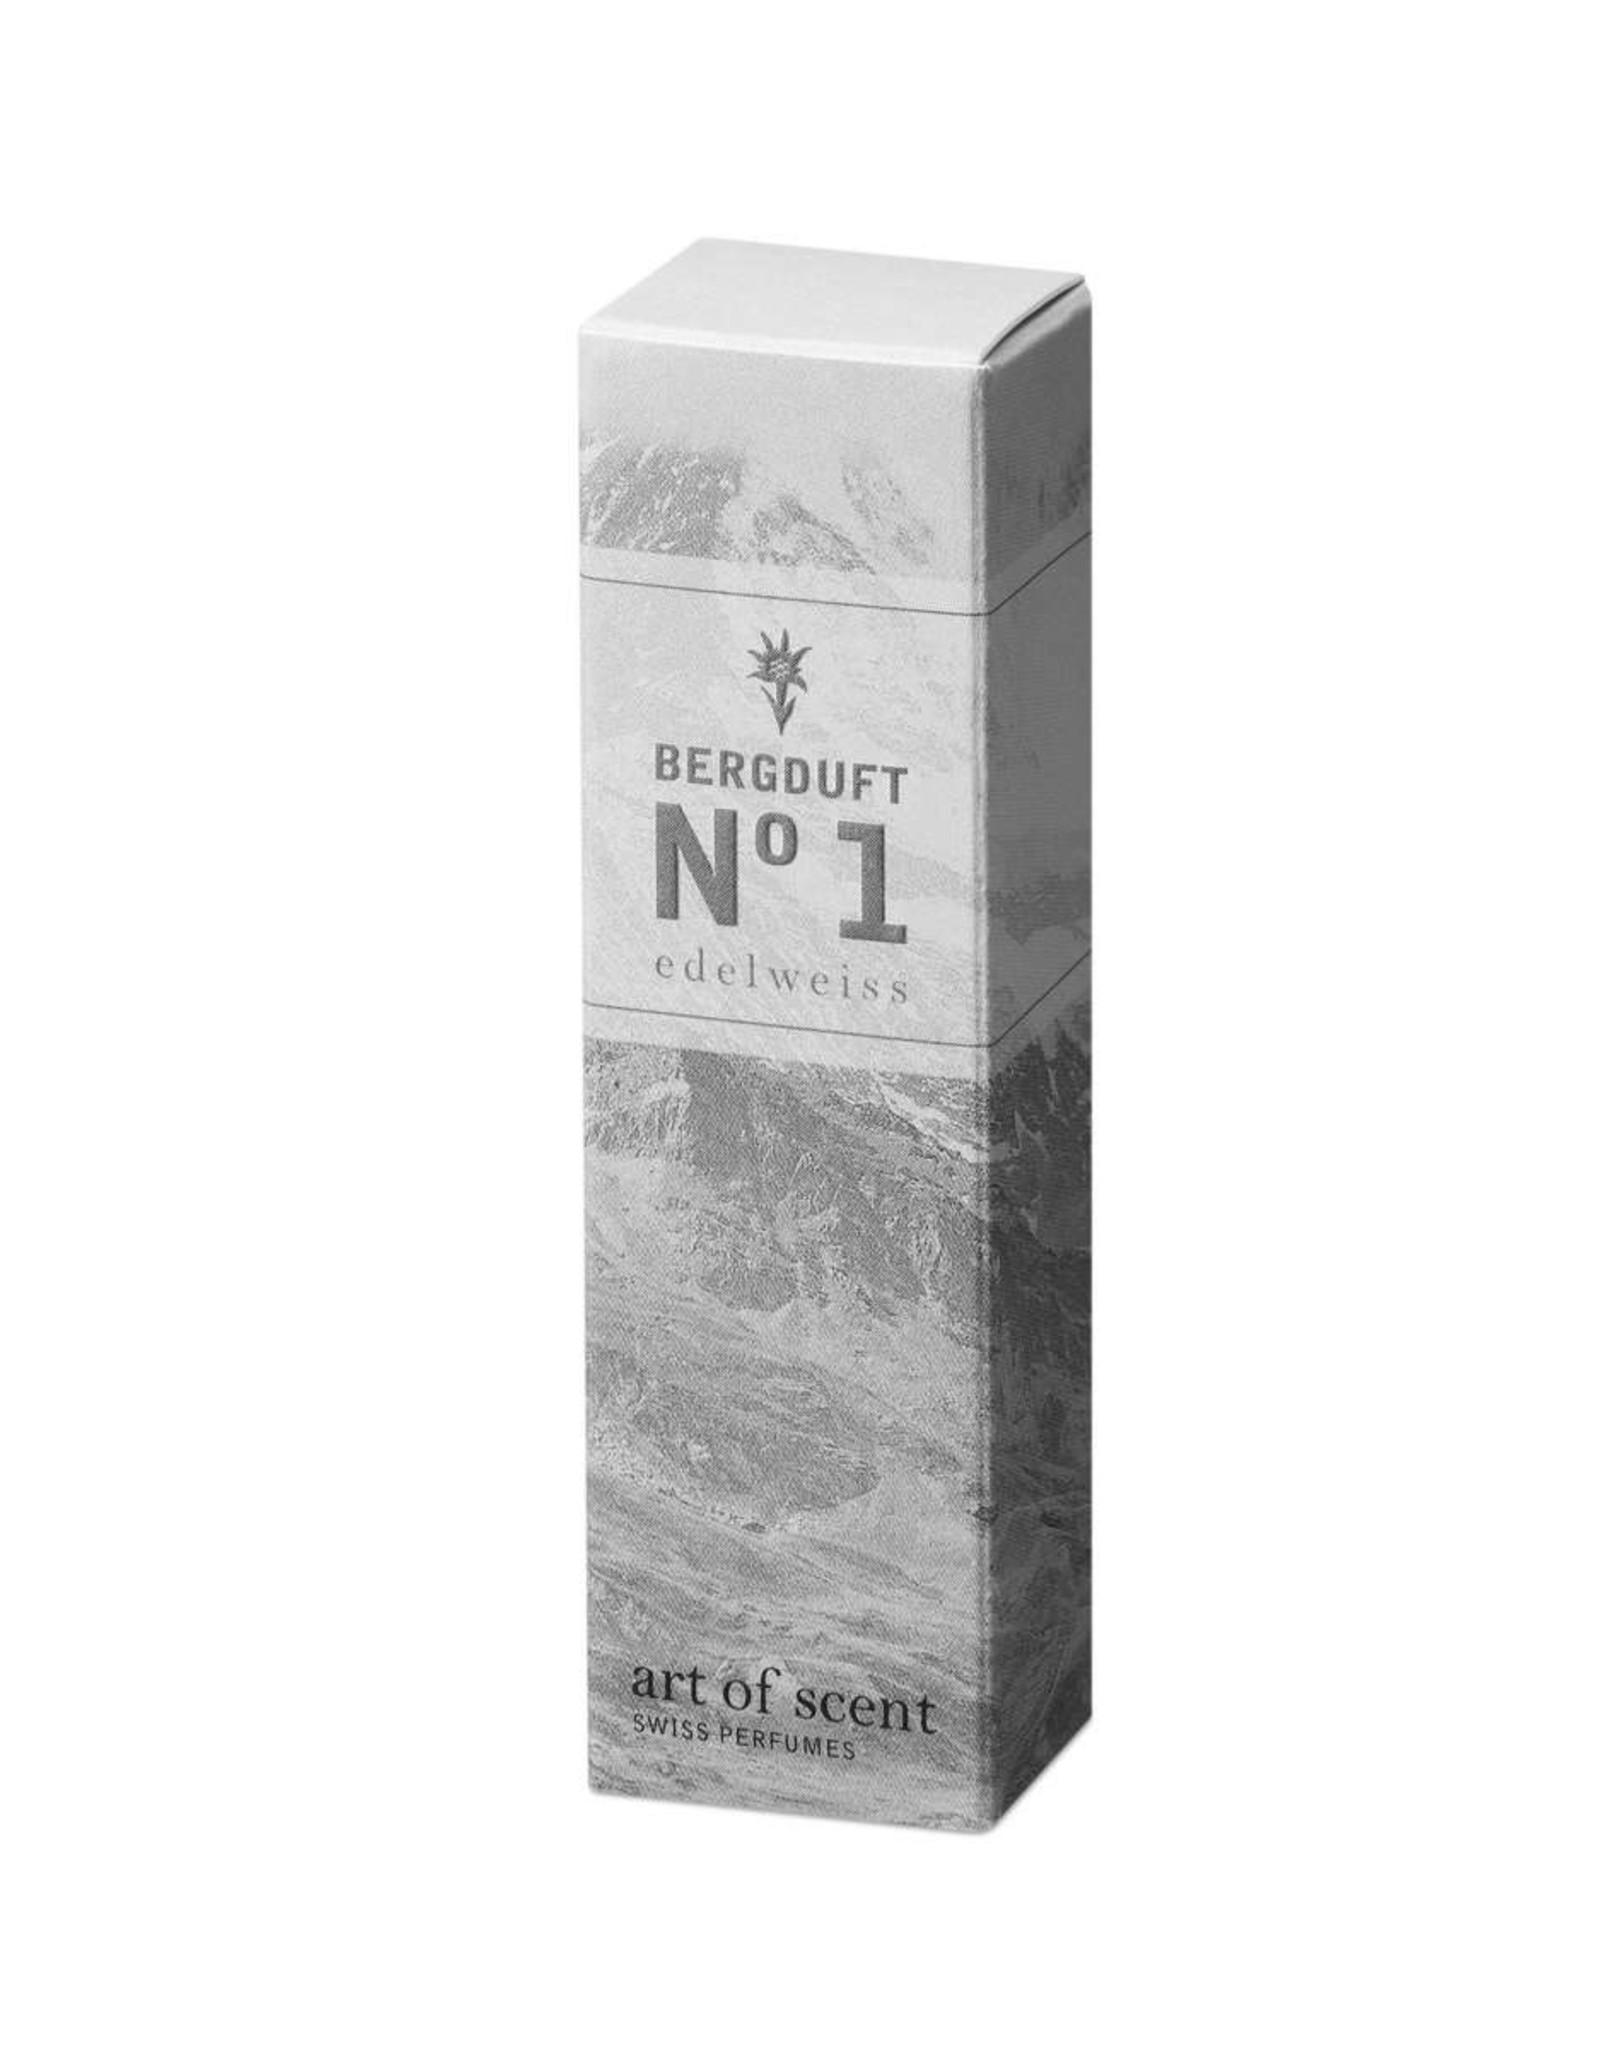 Bergduft Eau de Parfum Rollon N° 1 Edelweisstoff